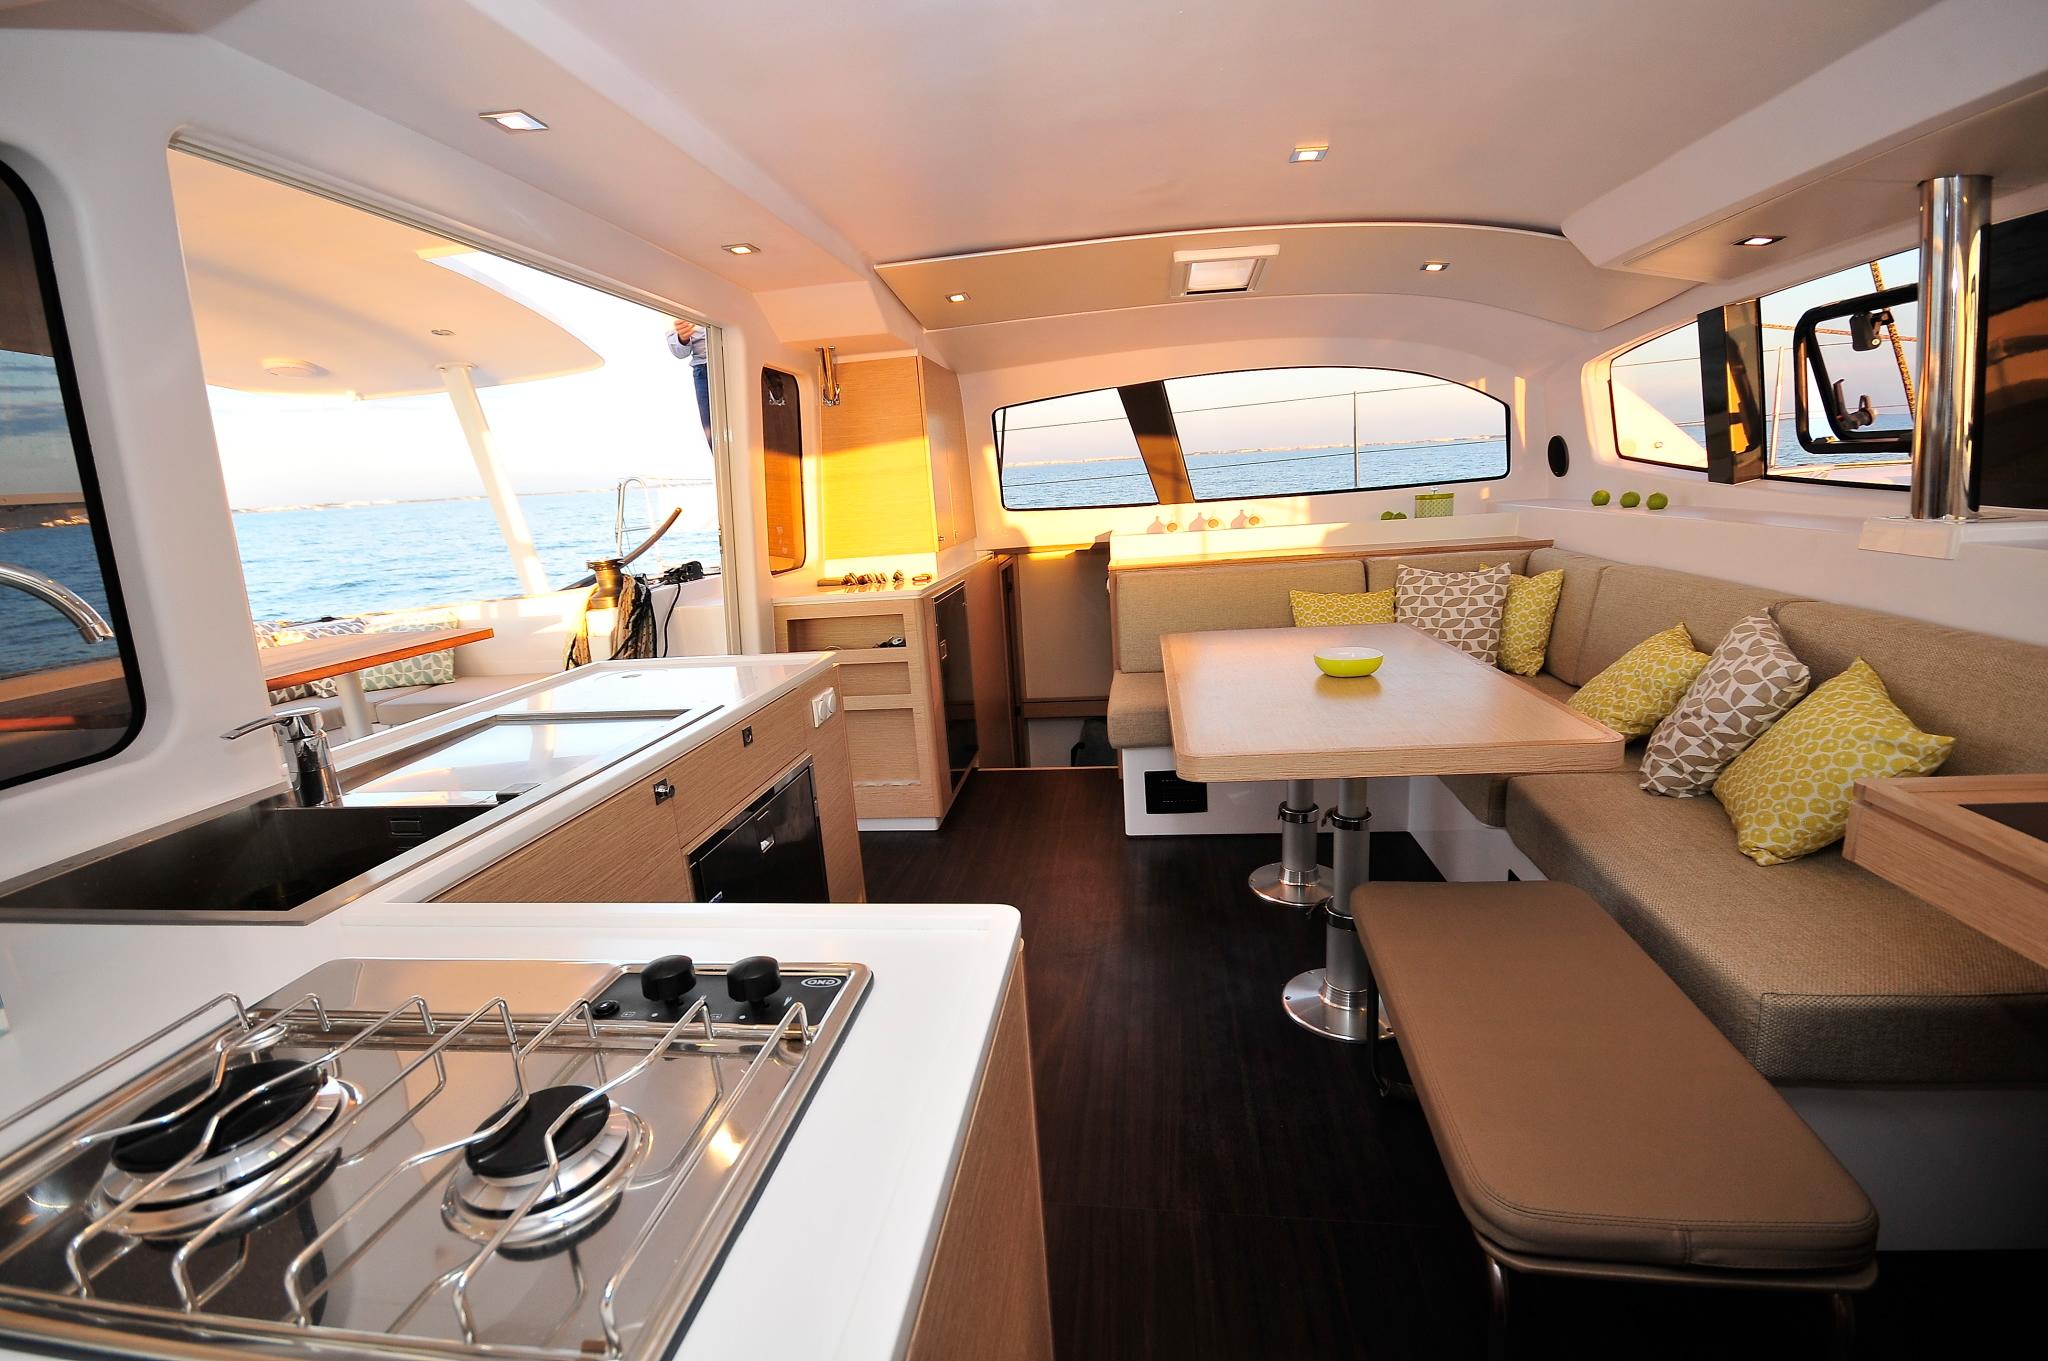 Outremer 45 catamaran interior galley.jpg